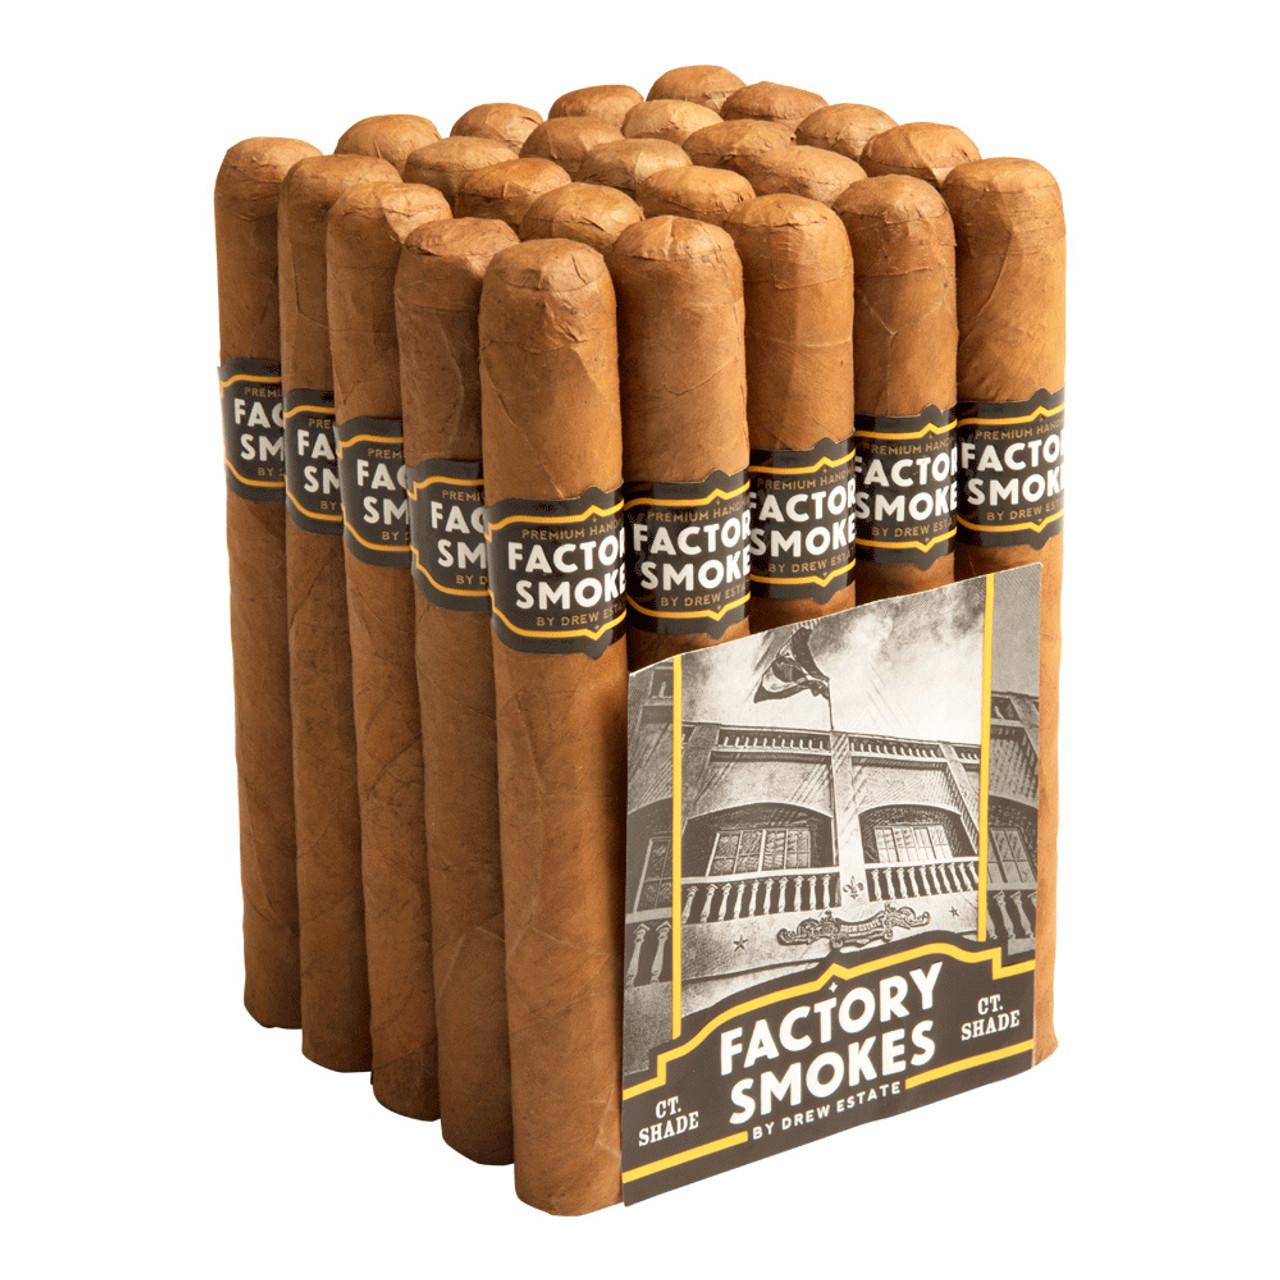 Factory Smokes by Drew Estate Toro Shade Cigars - 6 x 52 (Bundle of 20)